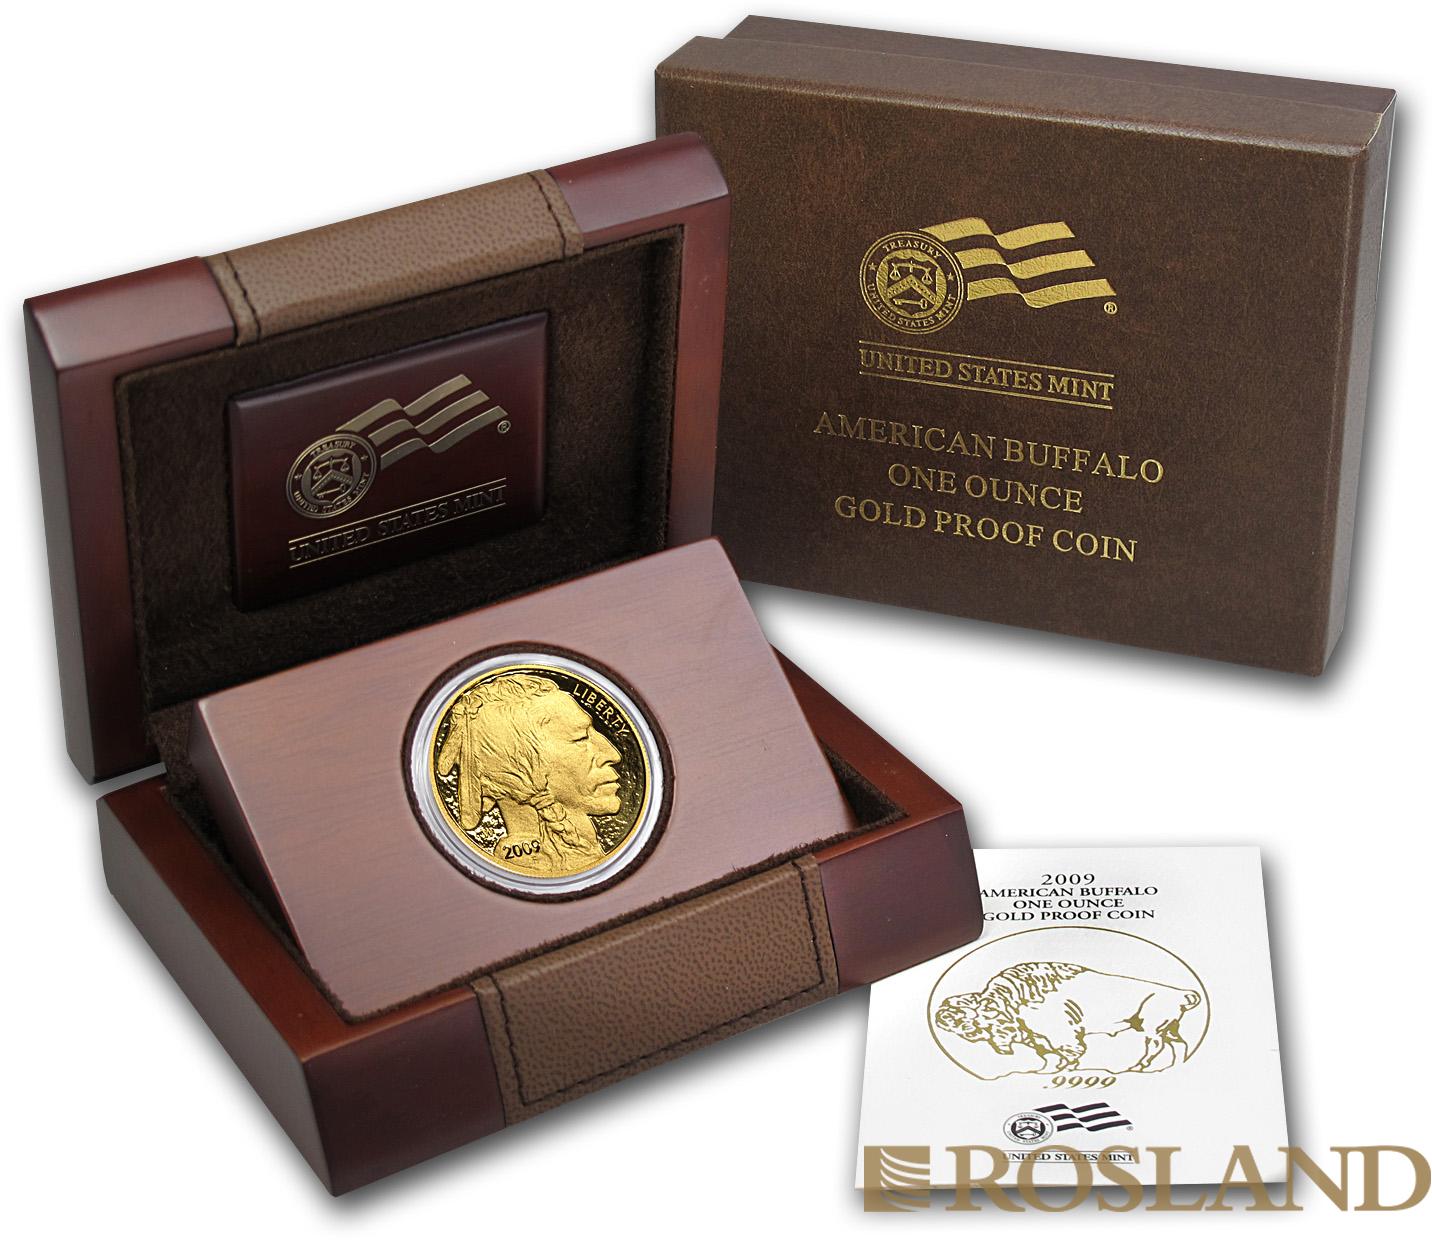 1 Unze Goldmünze American Buffalo 2009 PP (Box, Zertifikat)